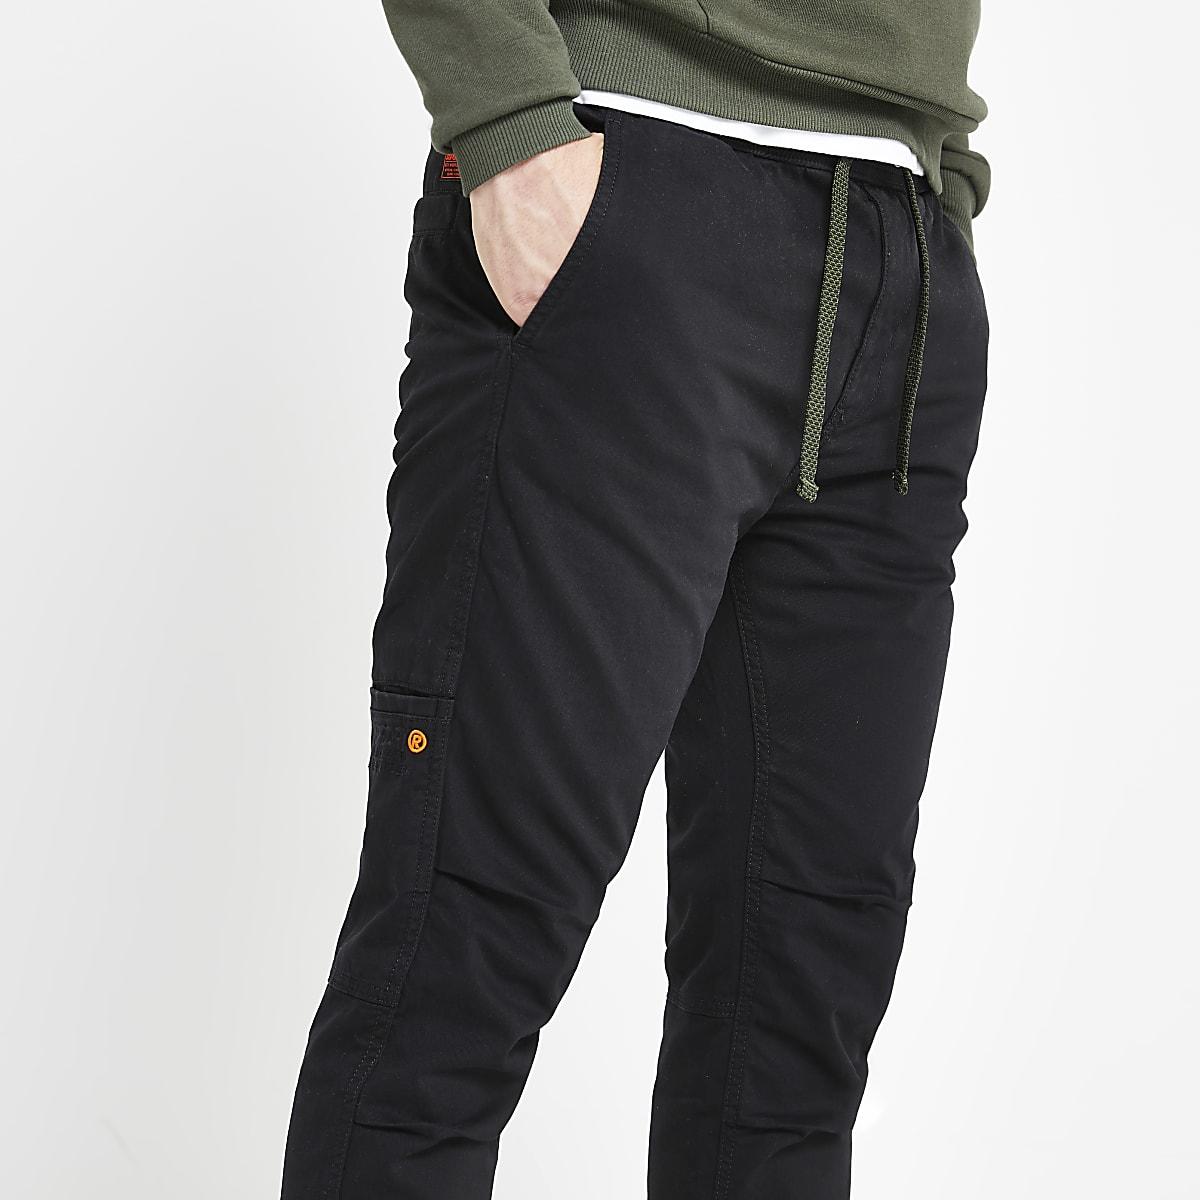 Superdry black cargo pants